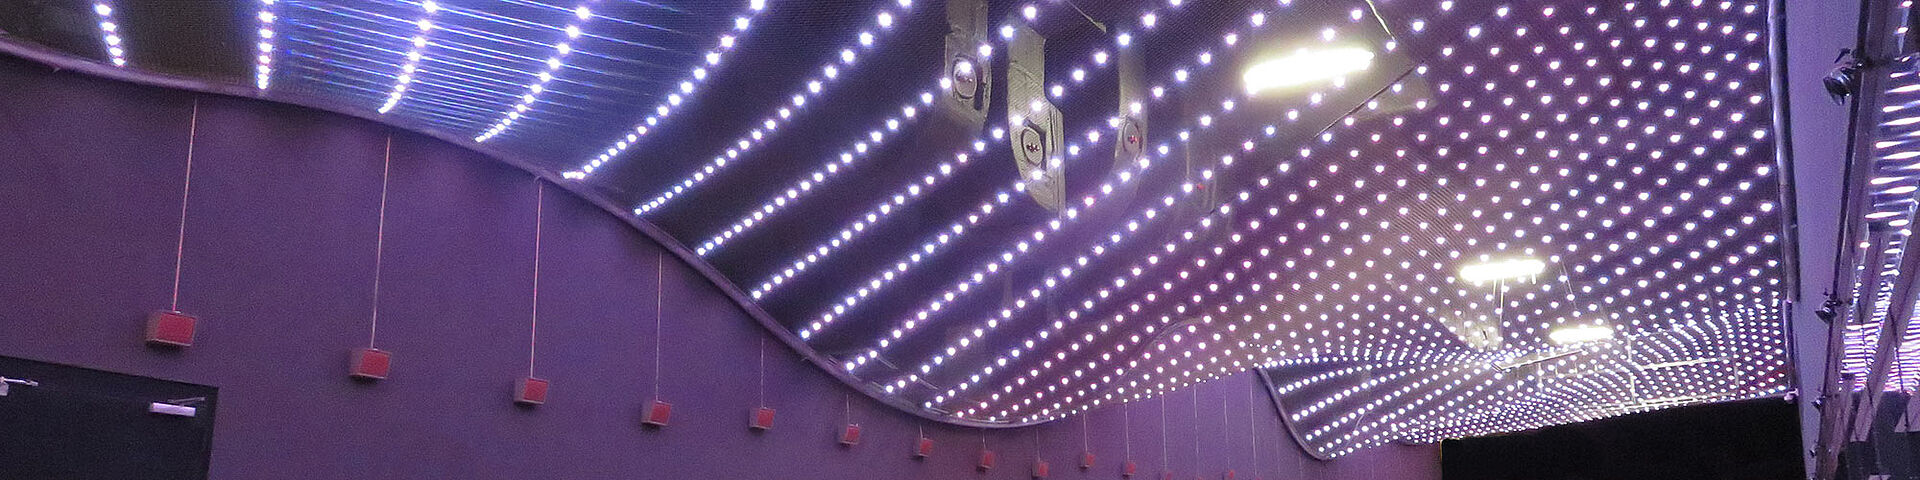 LED Light ceilings X-LED LED modules